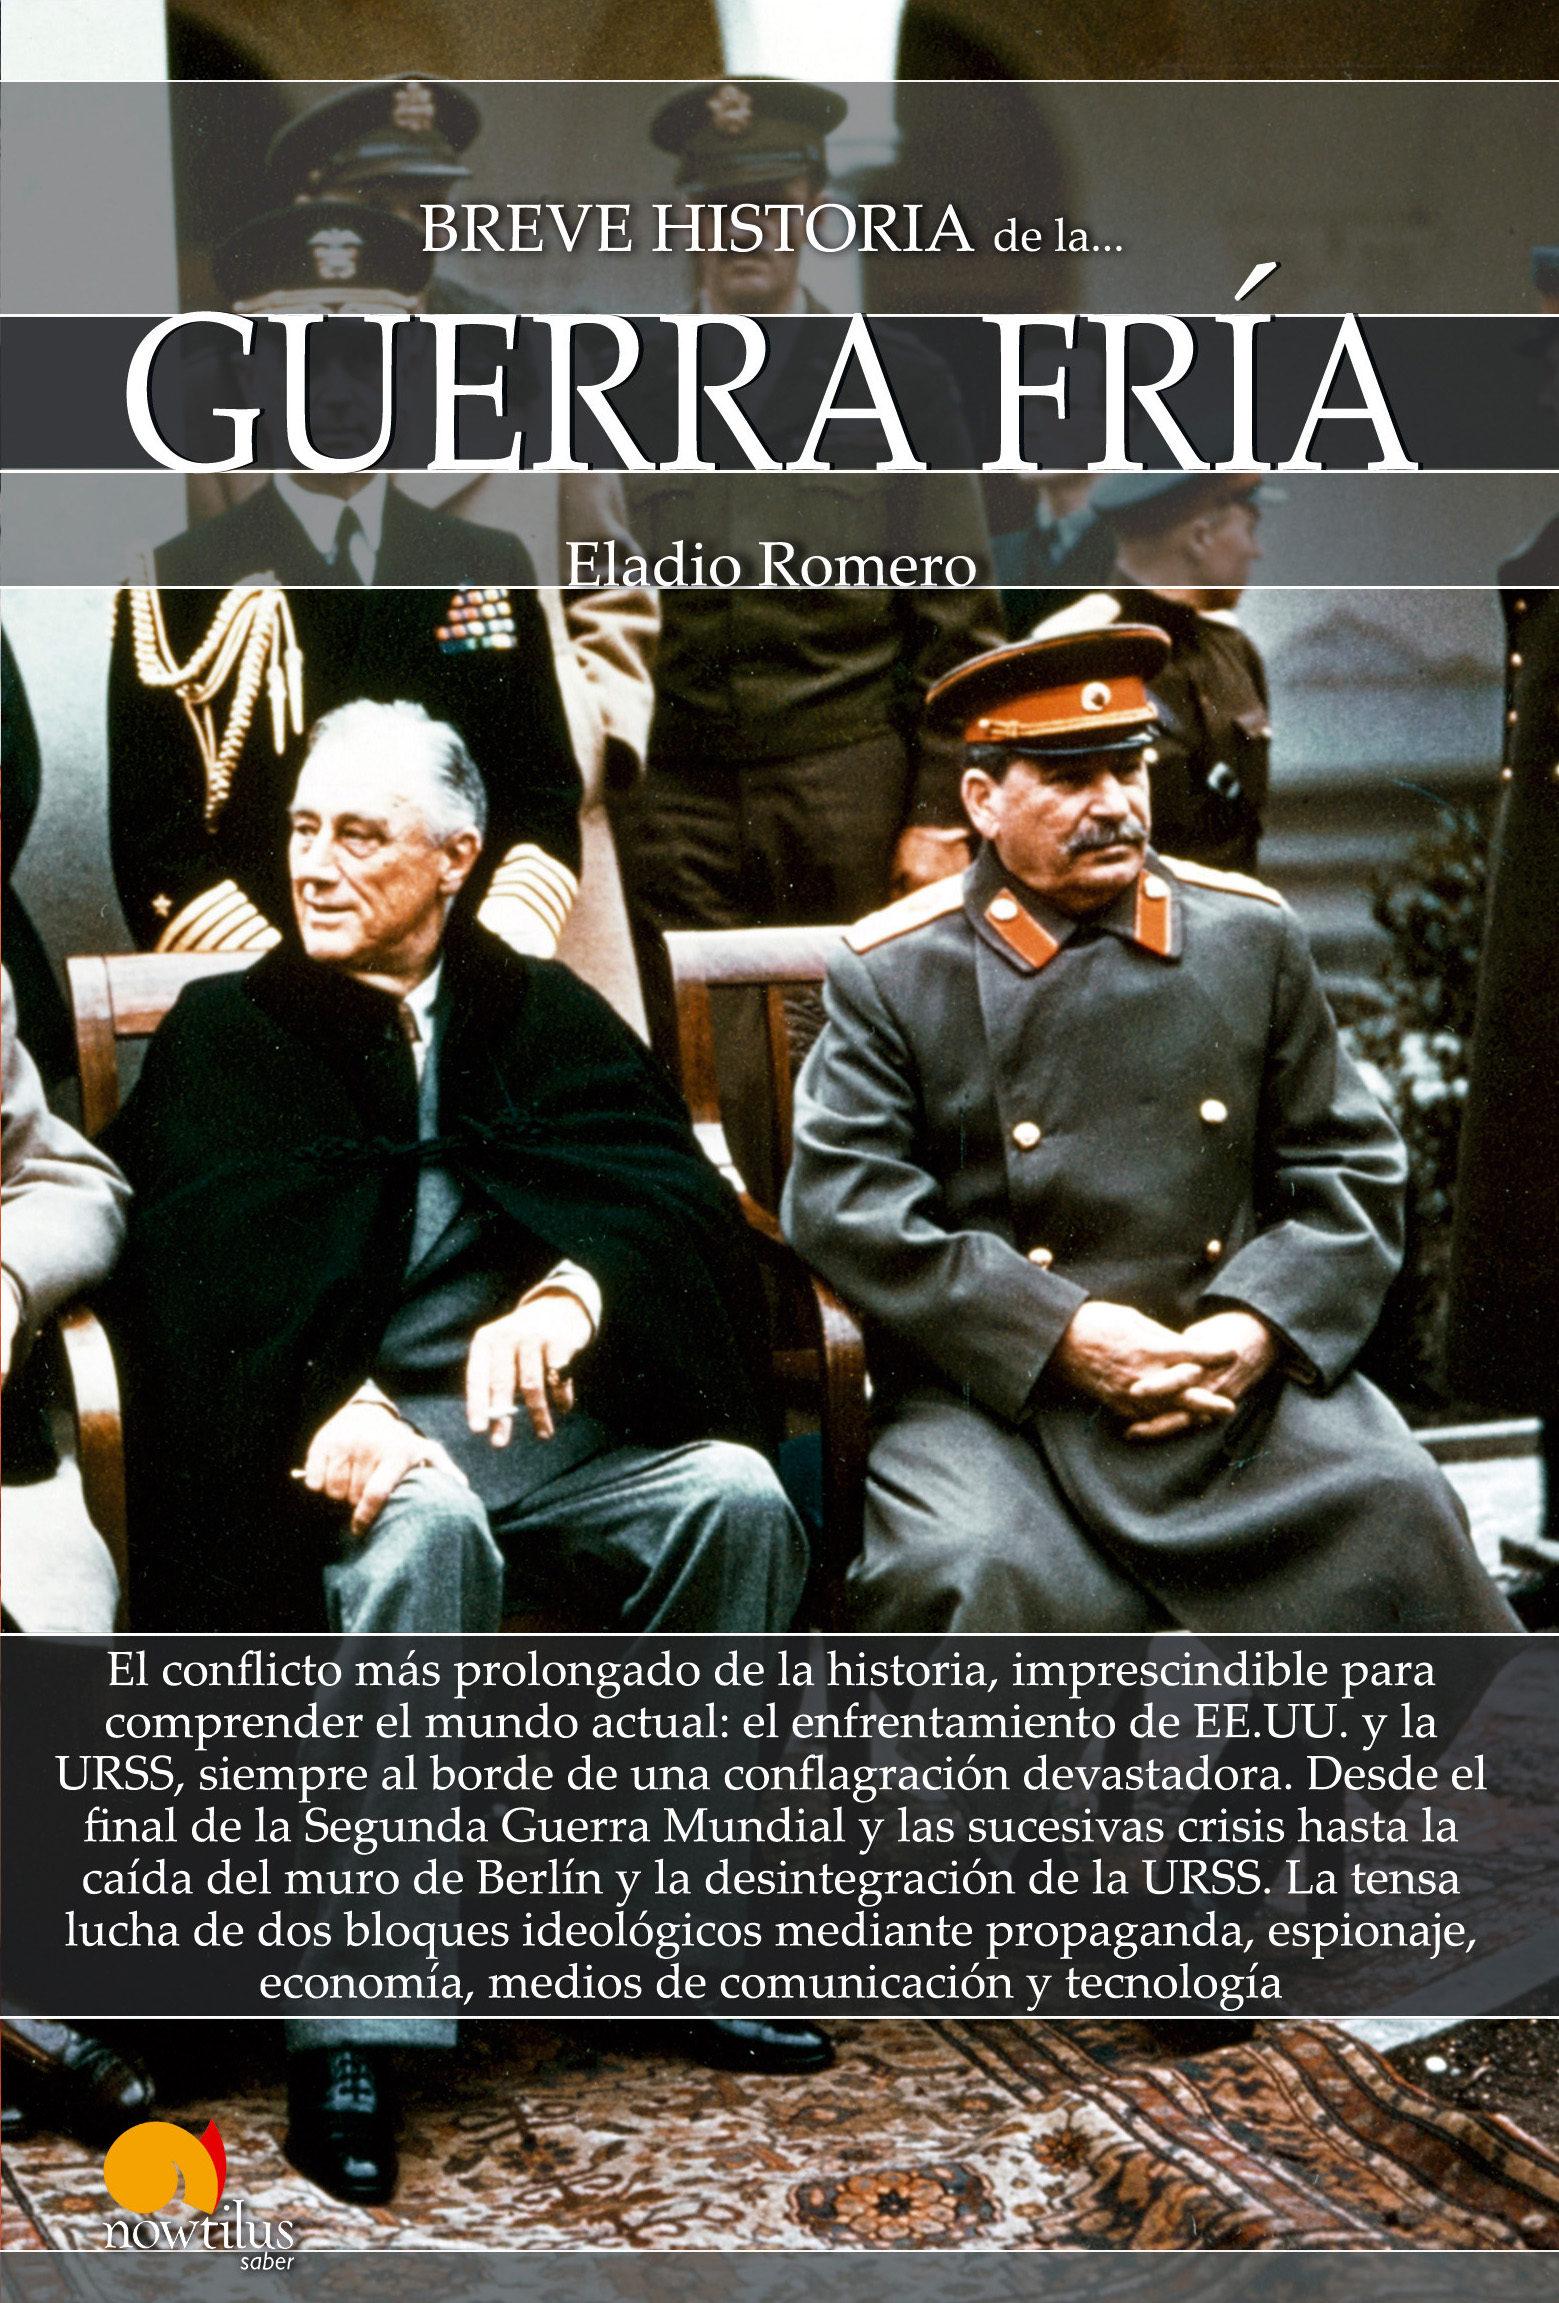 Breve Historia De La Guerra Fria Eladio Romero Comprar Libro